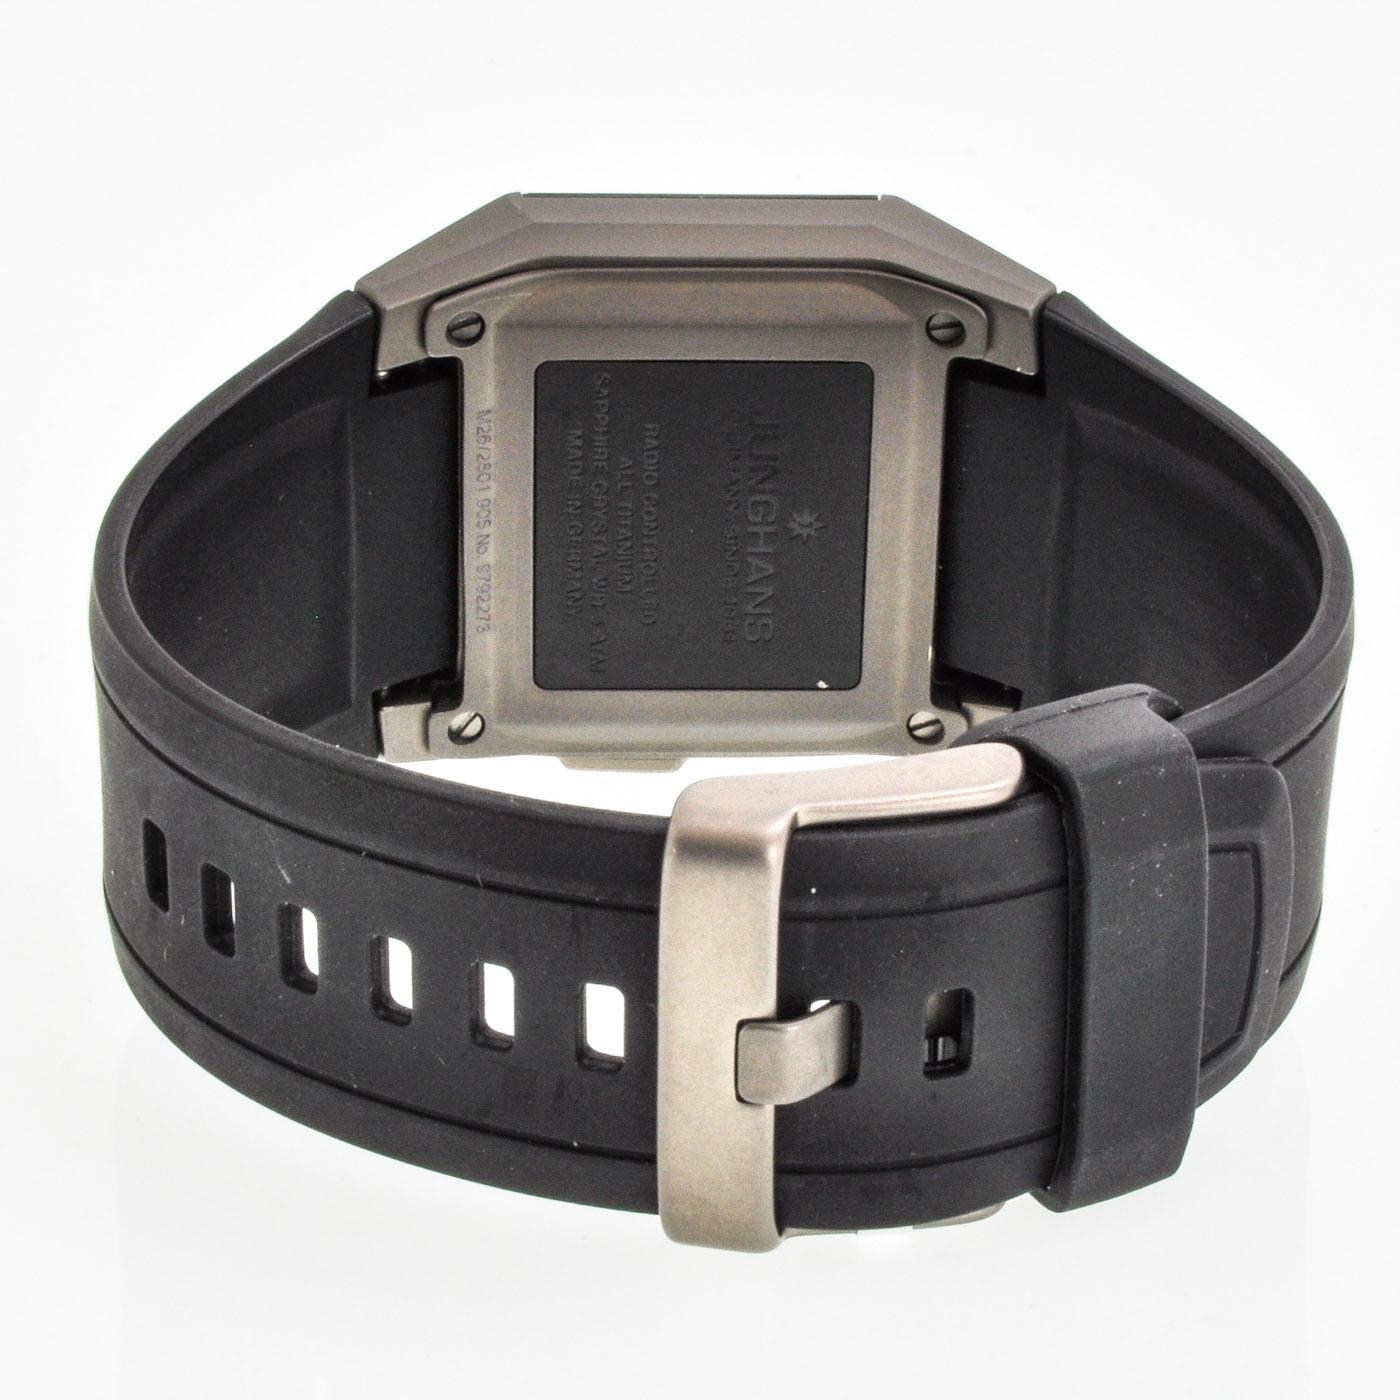 Lot 4040 - Three Watches - New